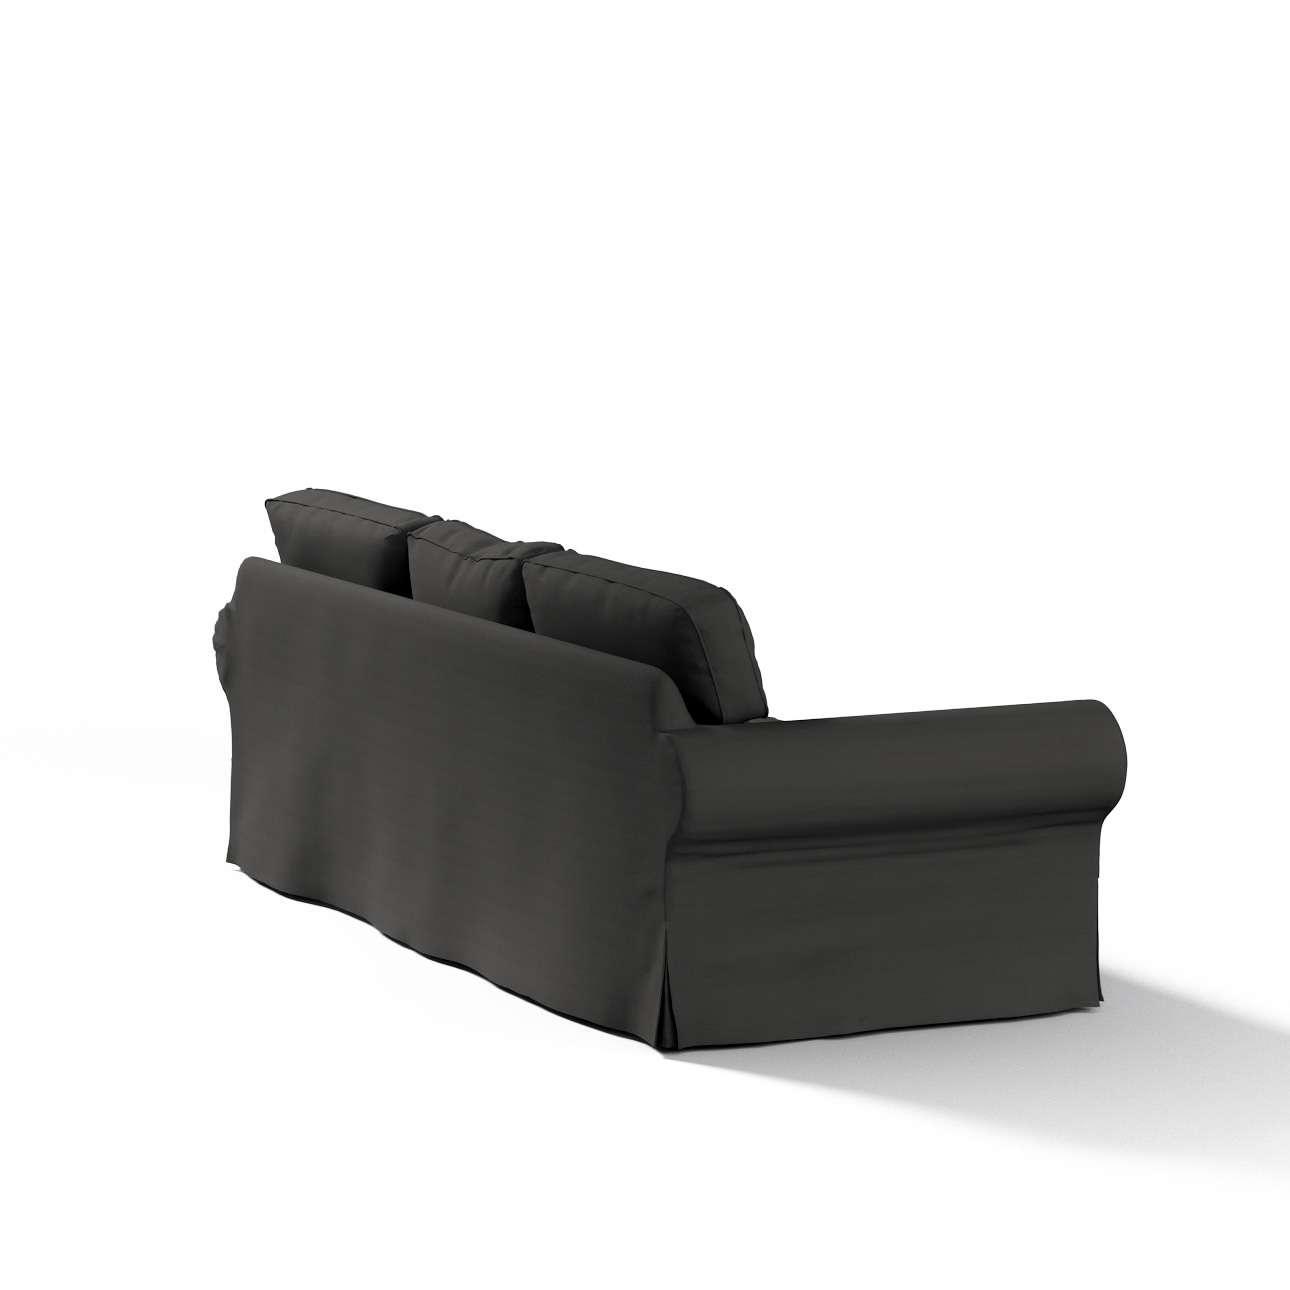 Ektorp 3-Sitzer Schlafsofabezug, ALTES Modell Sofahusse Ektorp 3-Sitzer Schlafsofa von der Kollektion Cotton Panama, Stoff: 702-08